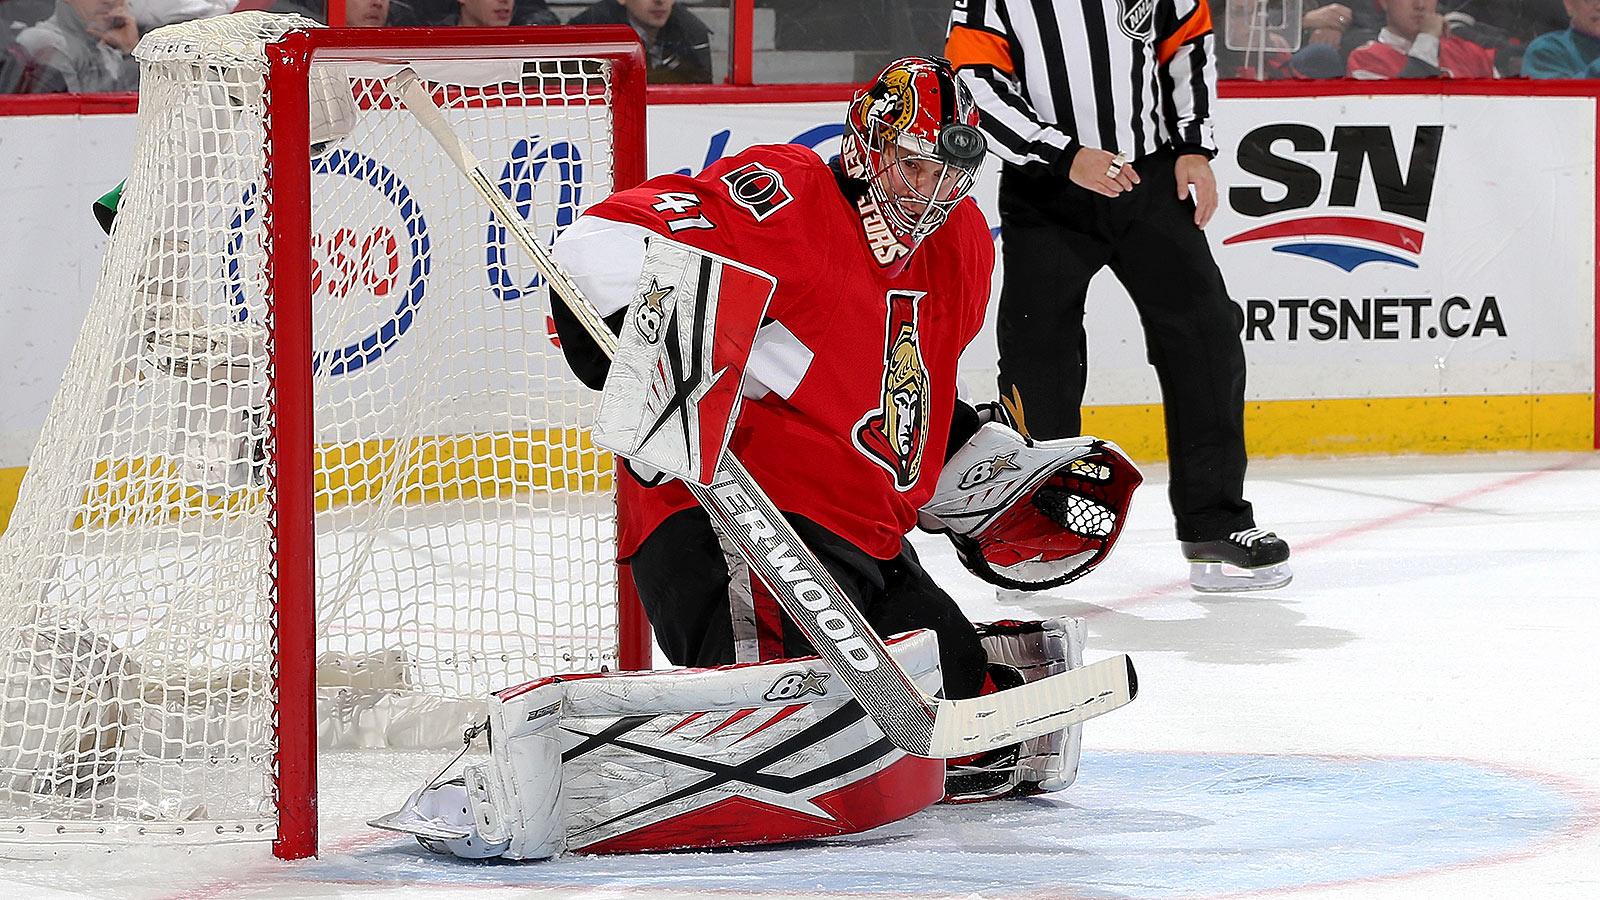 Senators finally win in Ottawa, outlast Calgary in shootout